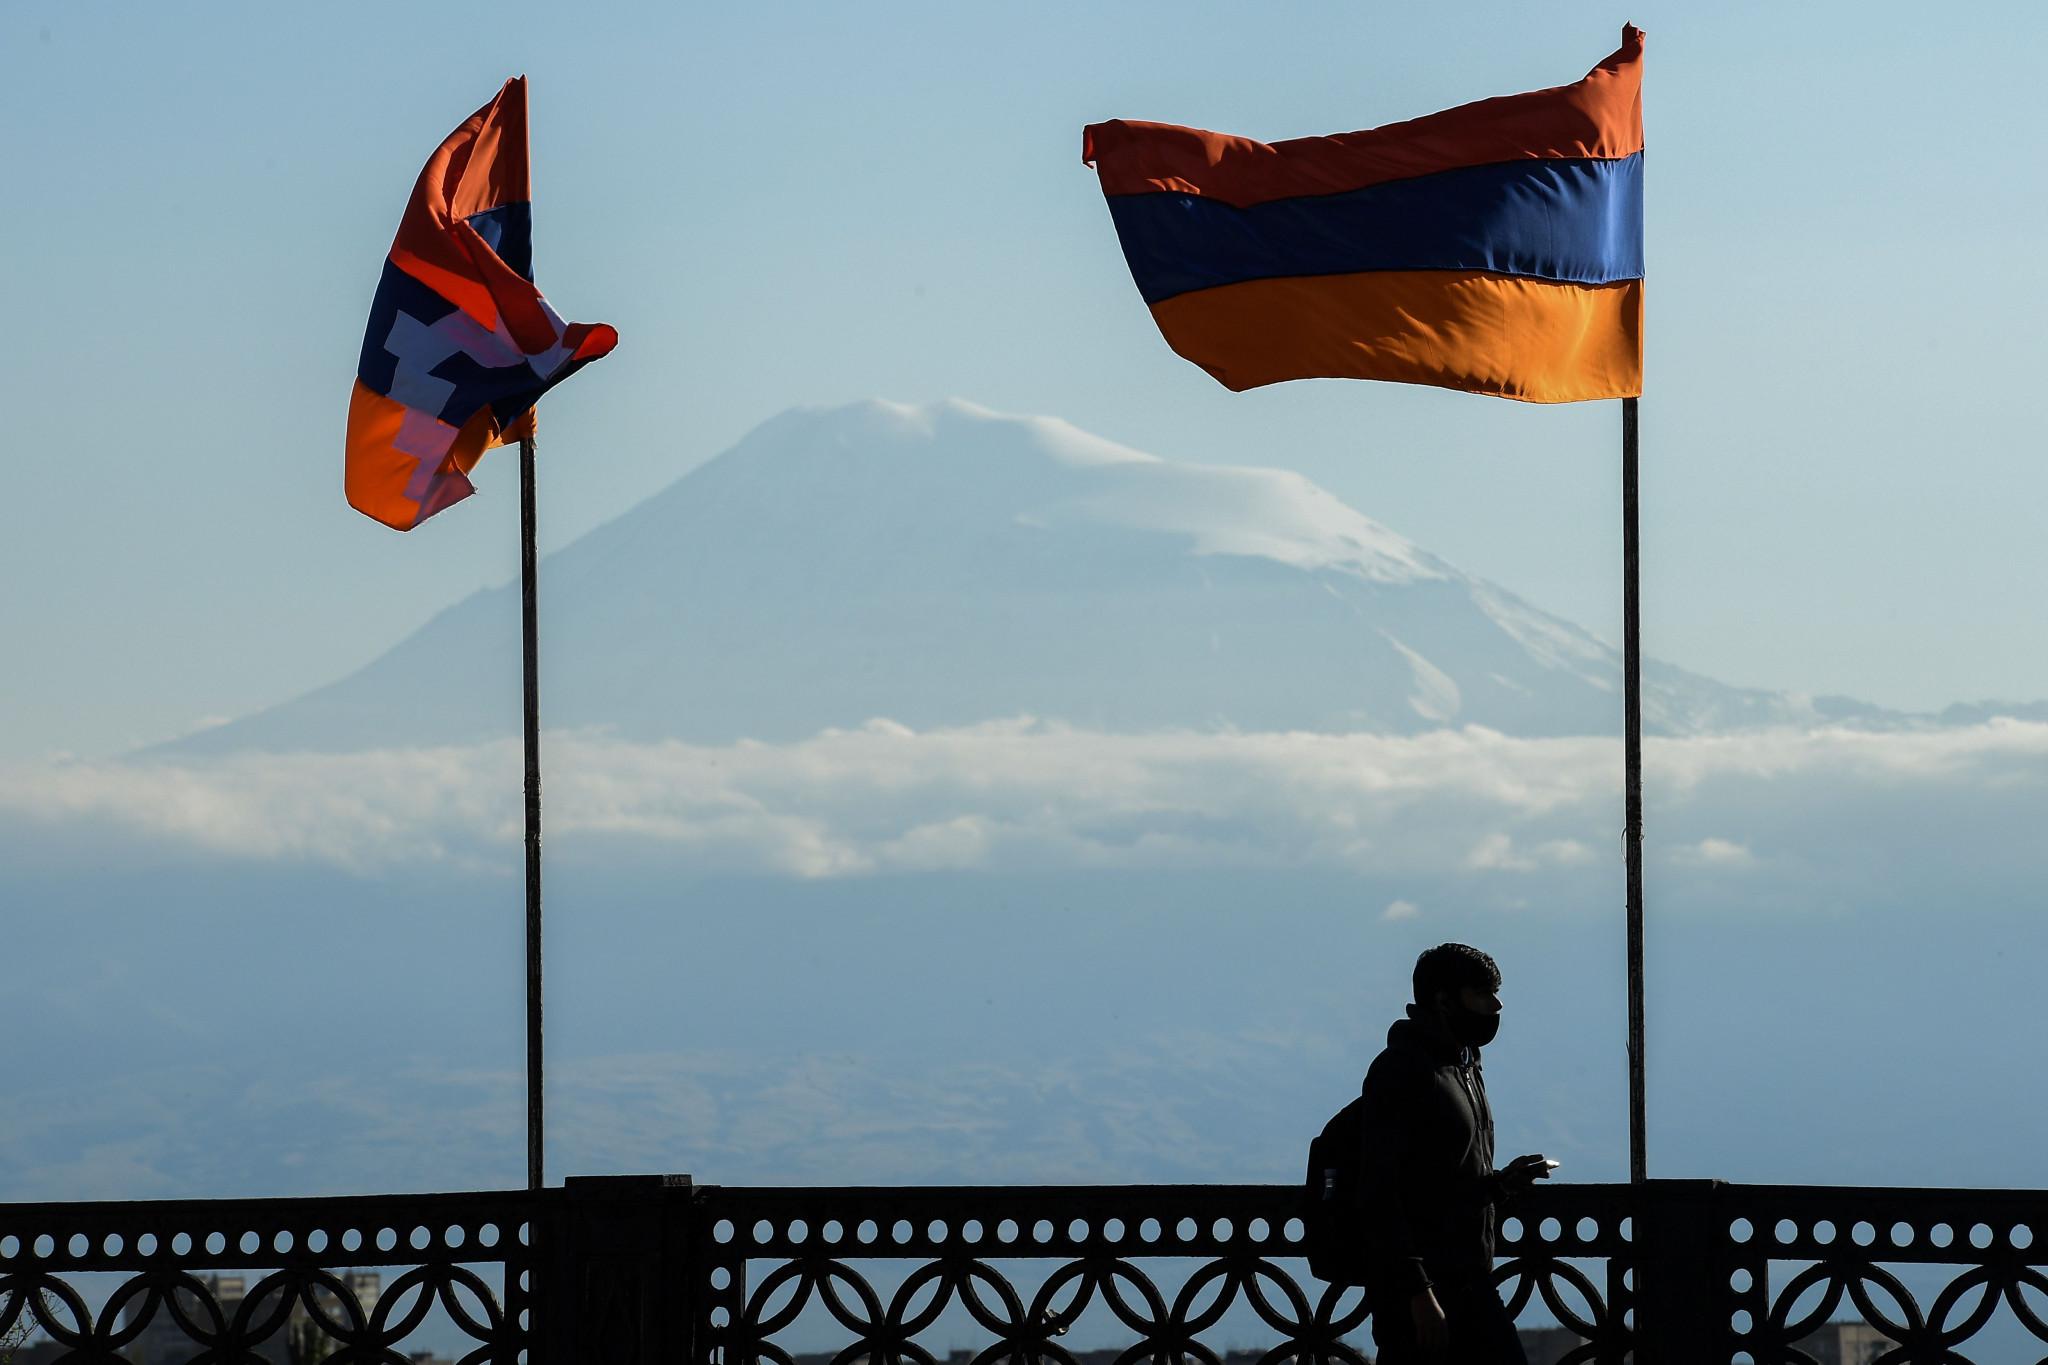 Armenia judoka Vardanyan released from Azerbaijan following IJF appeal